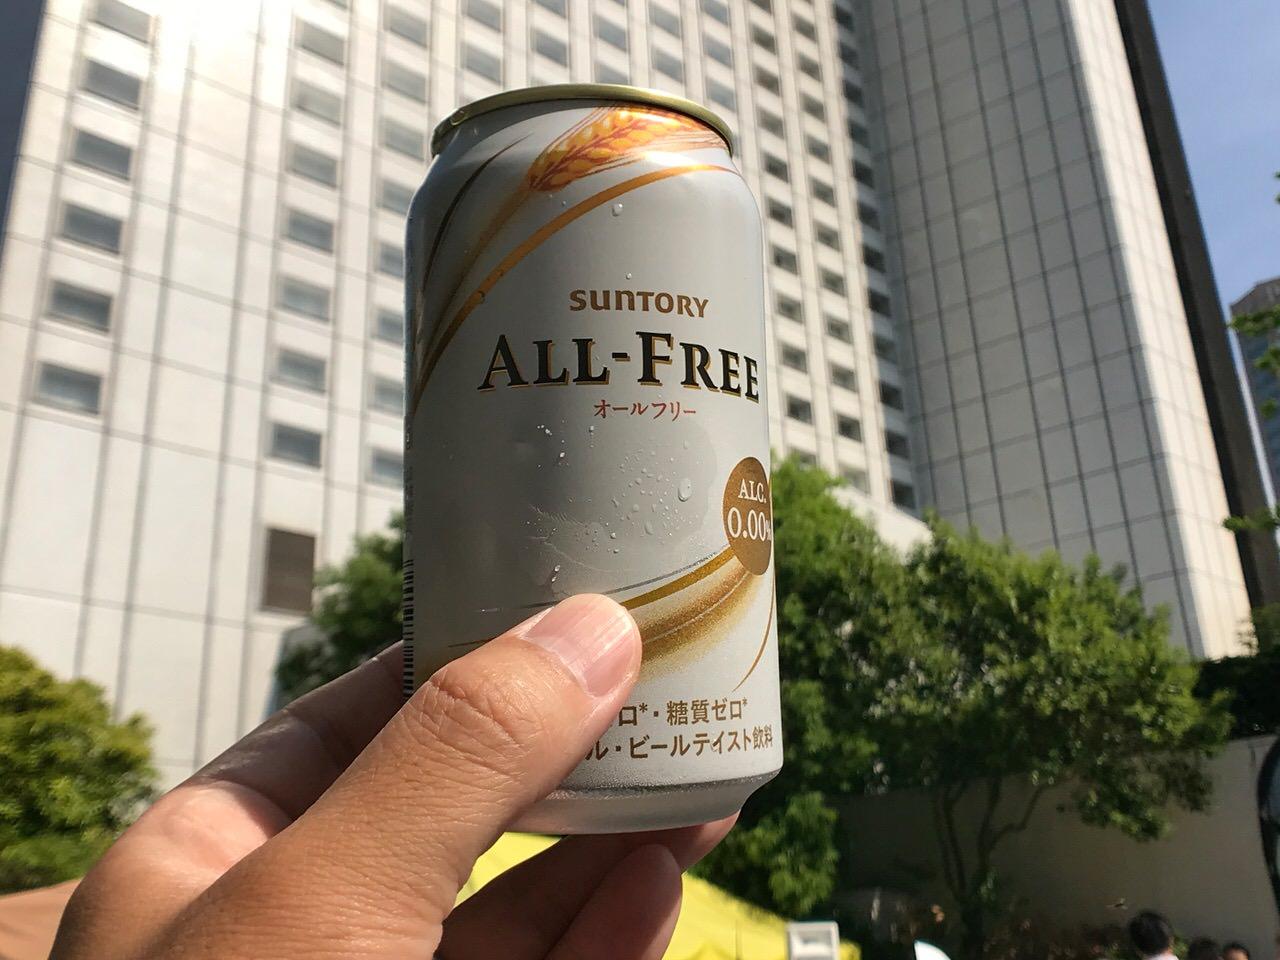 Suntory all free 2807